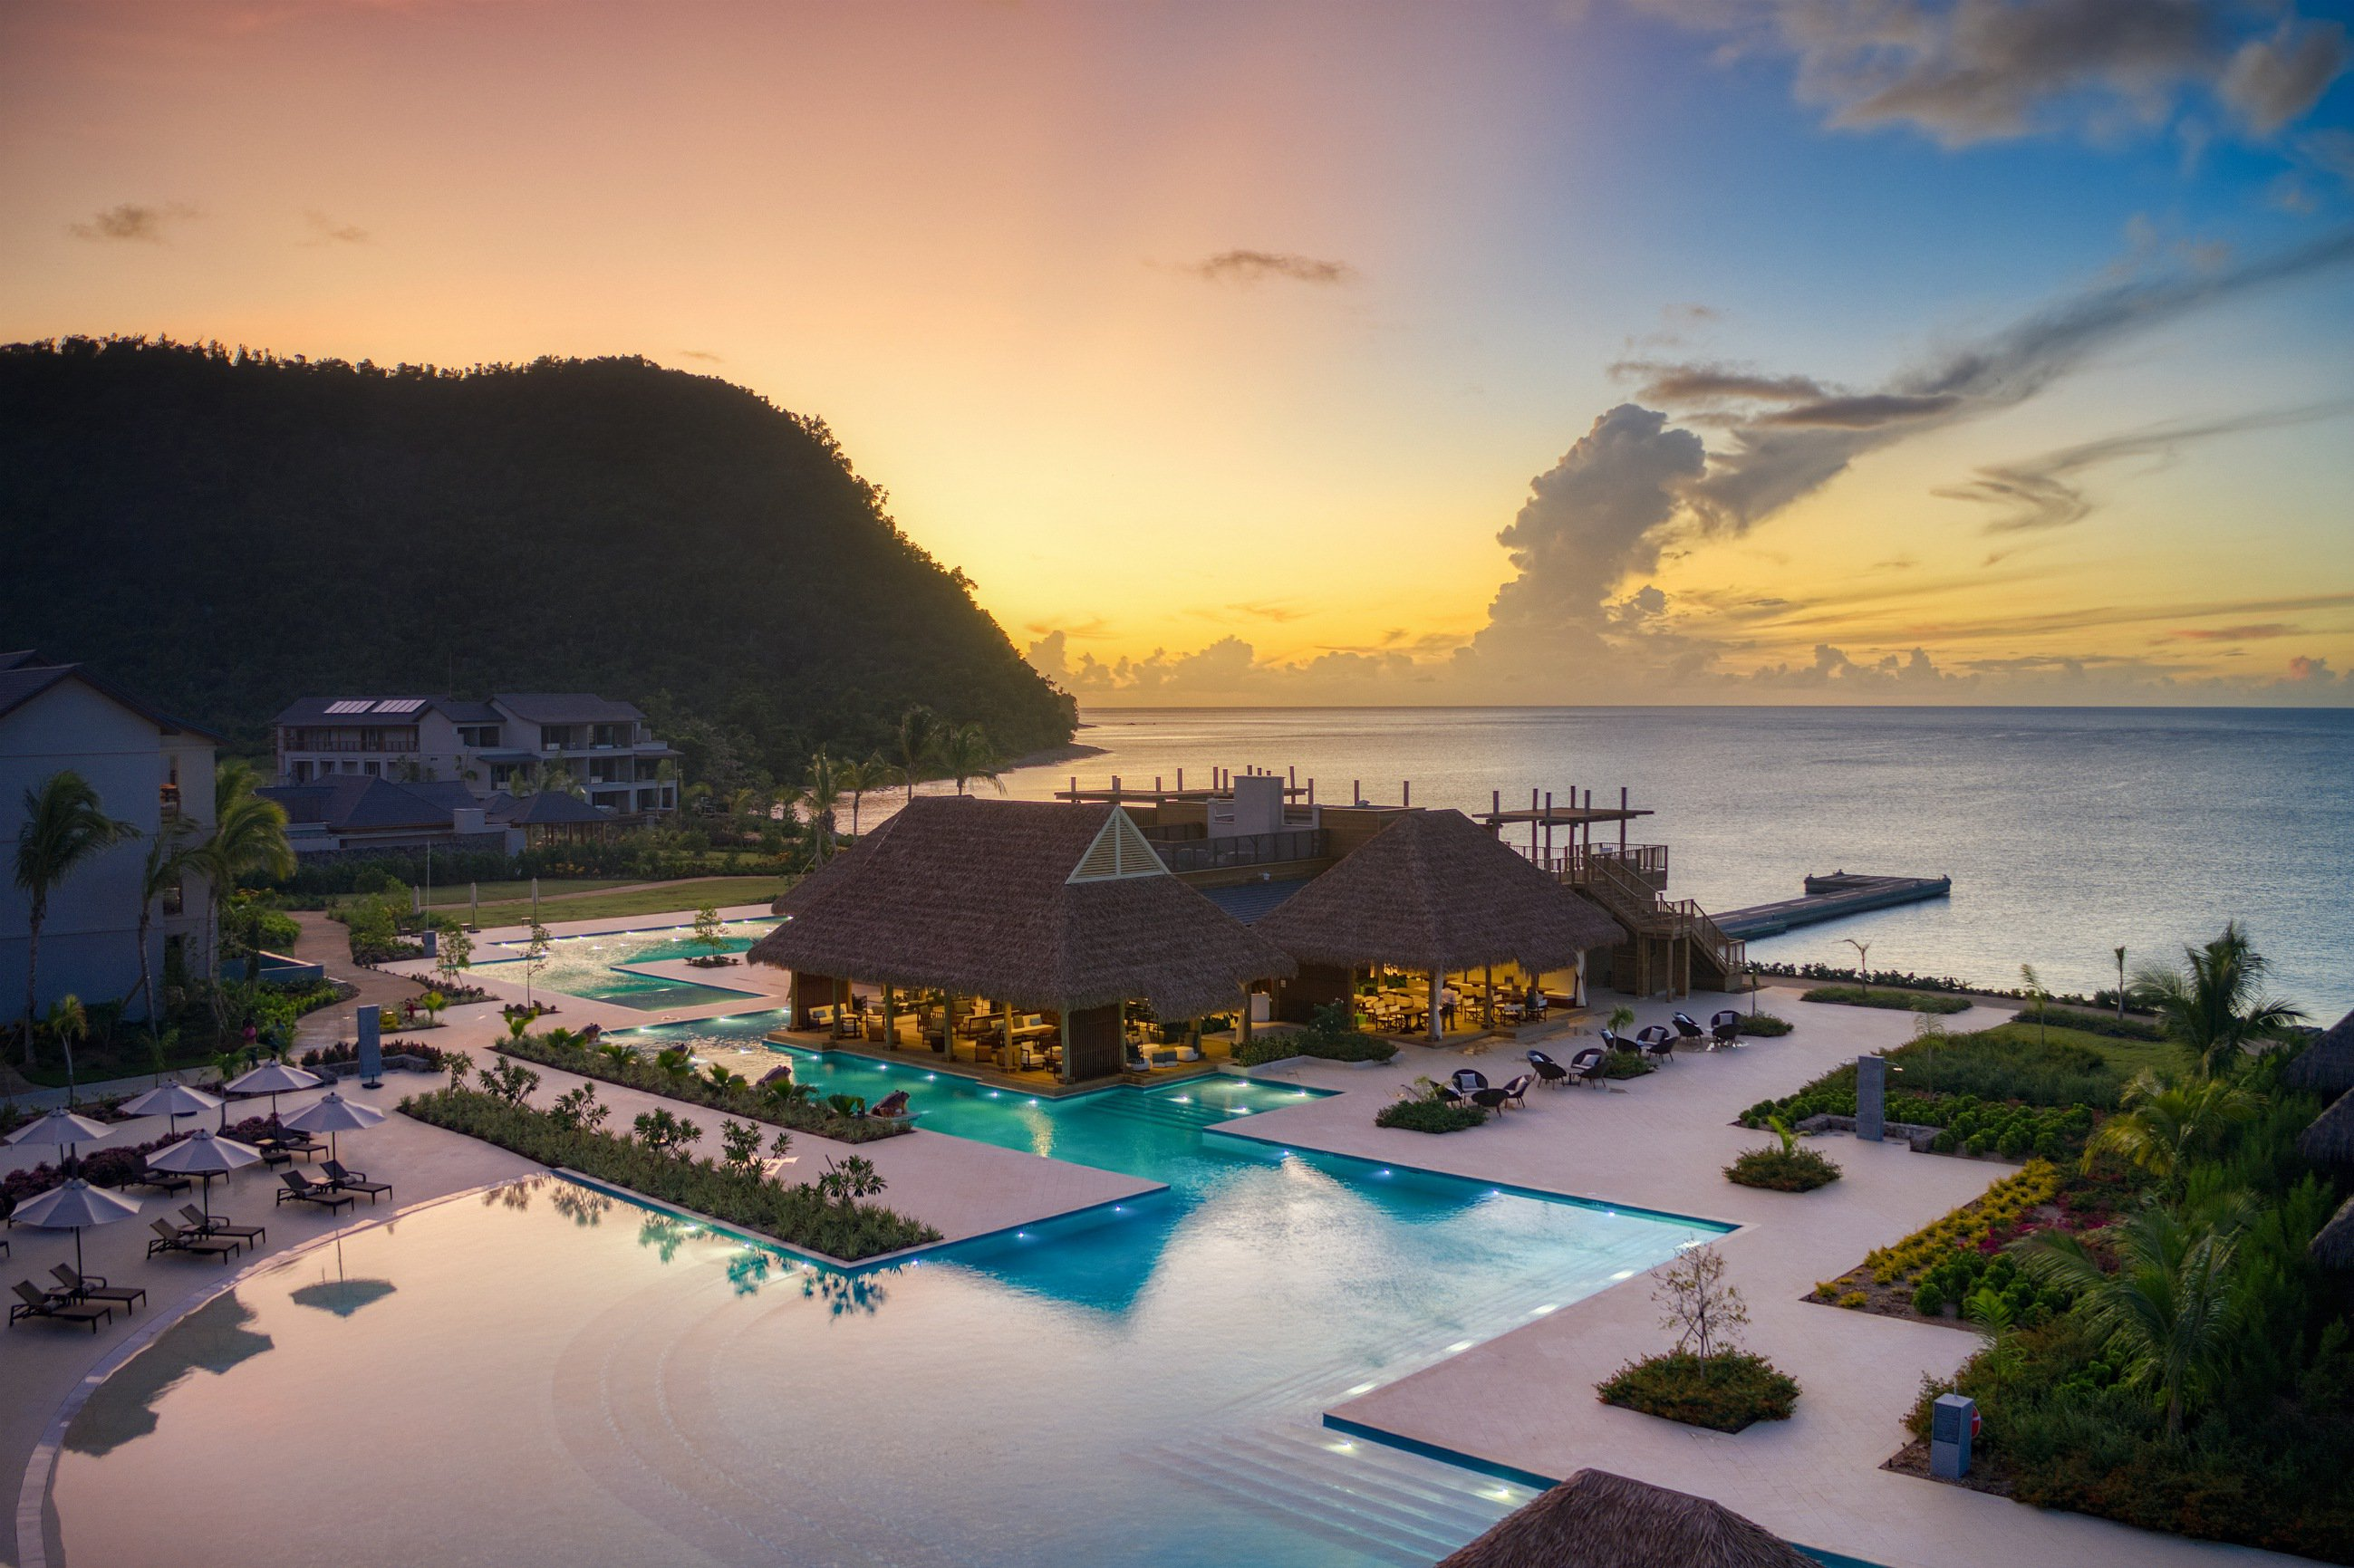 Cabrits Resort & Spa Kempinski Dominica exteriors